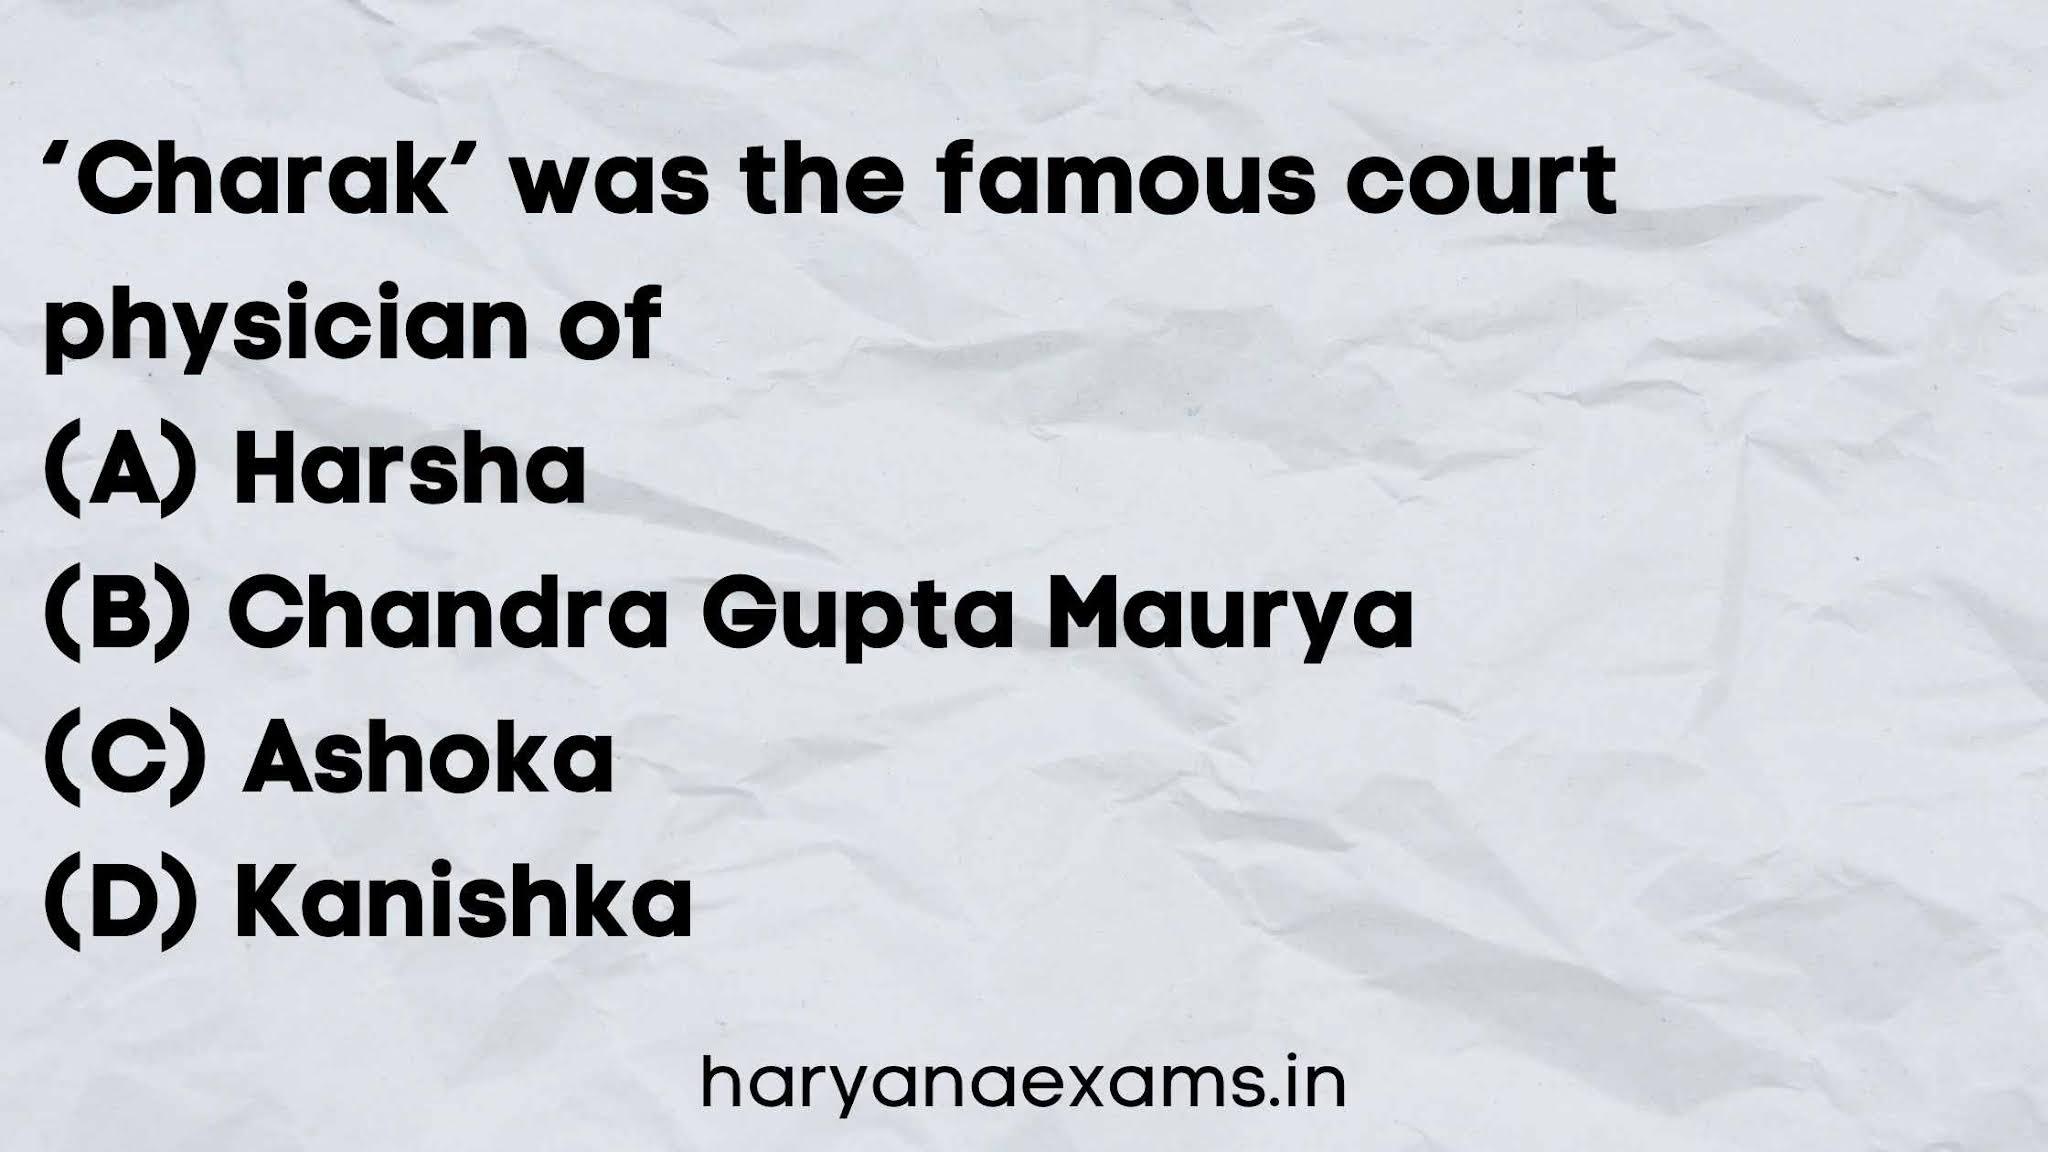 'Charak' was the famous court physician of   (A) Harsha   (B) Chandra Gupta Maurya   (C) Ashoka   (D) Kanishka